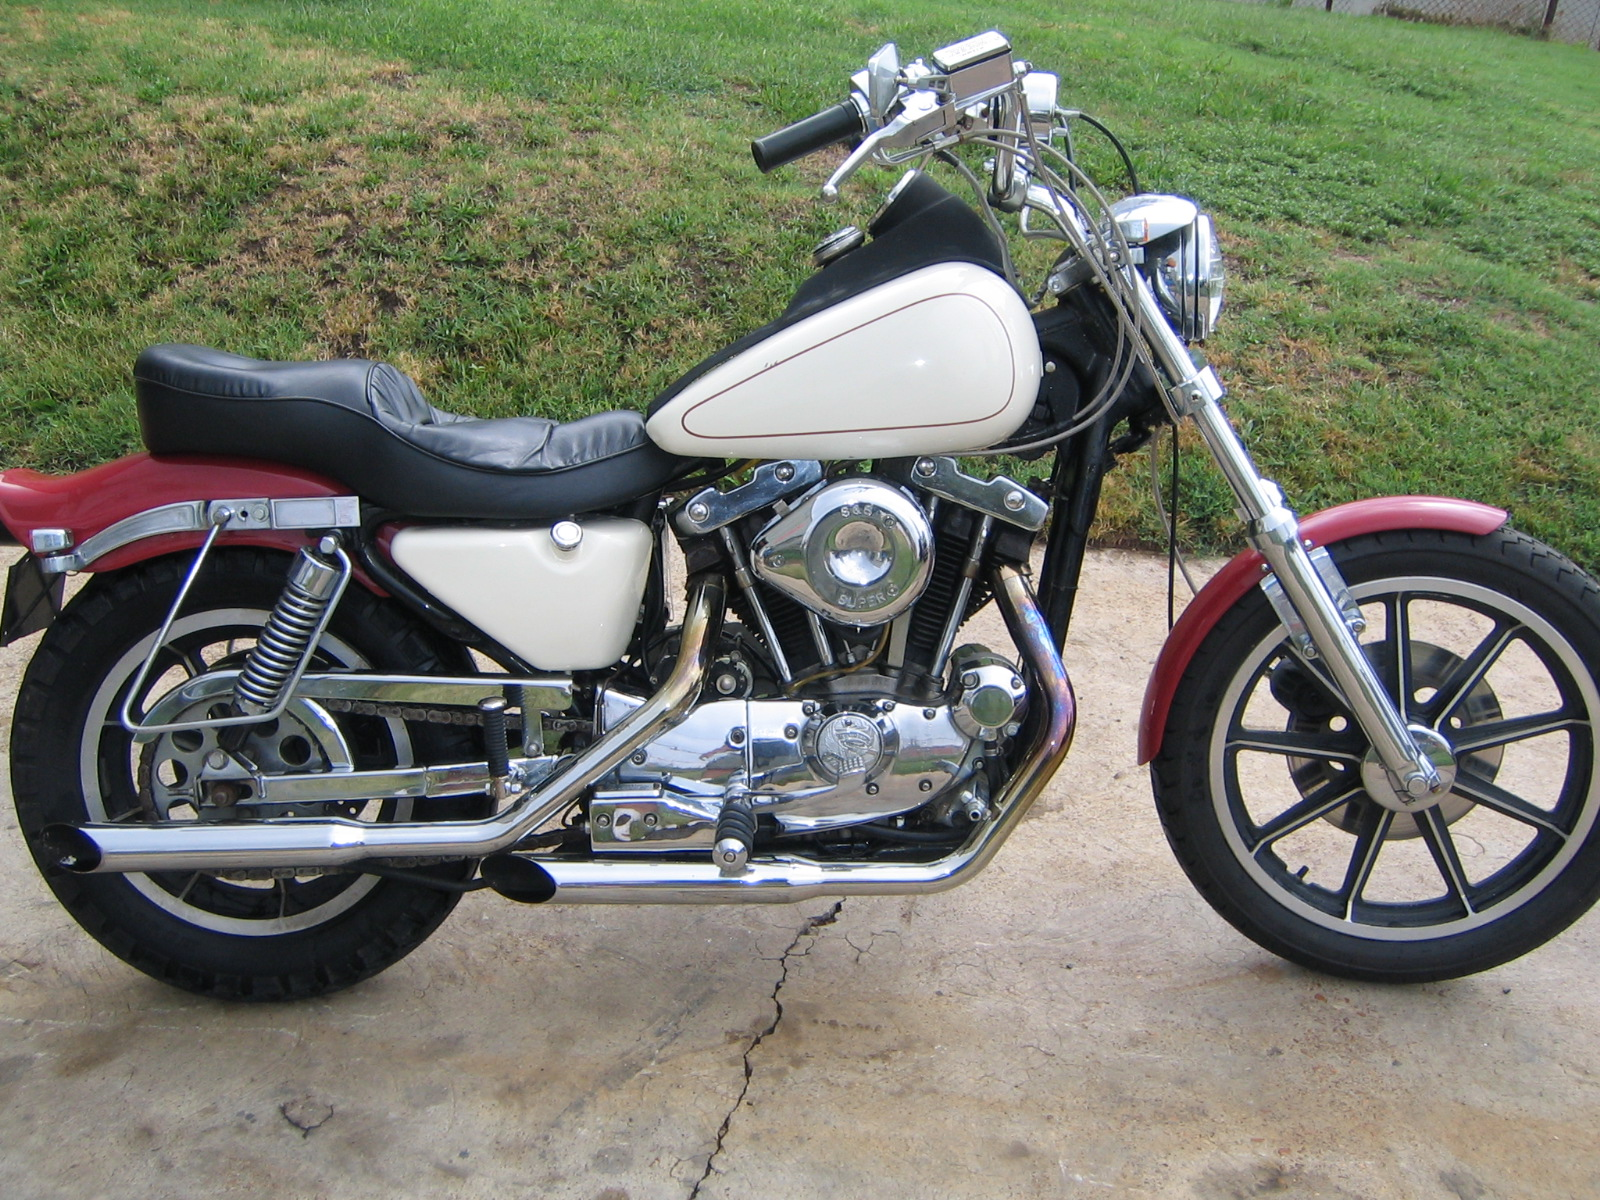 1984 Harley Davidson Xls